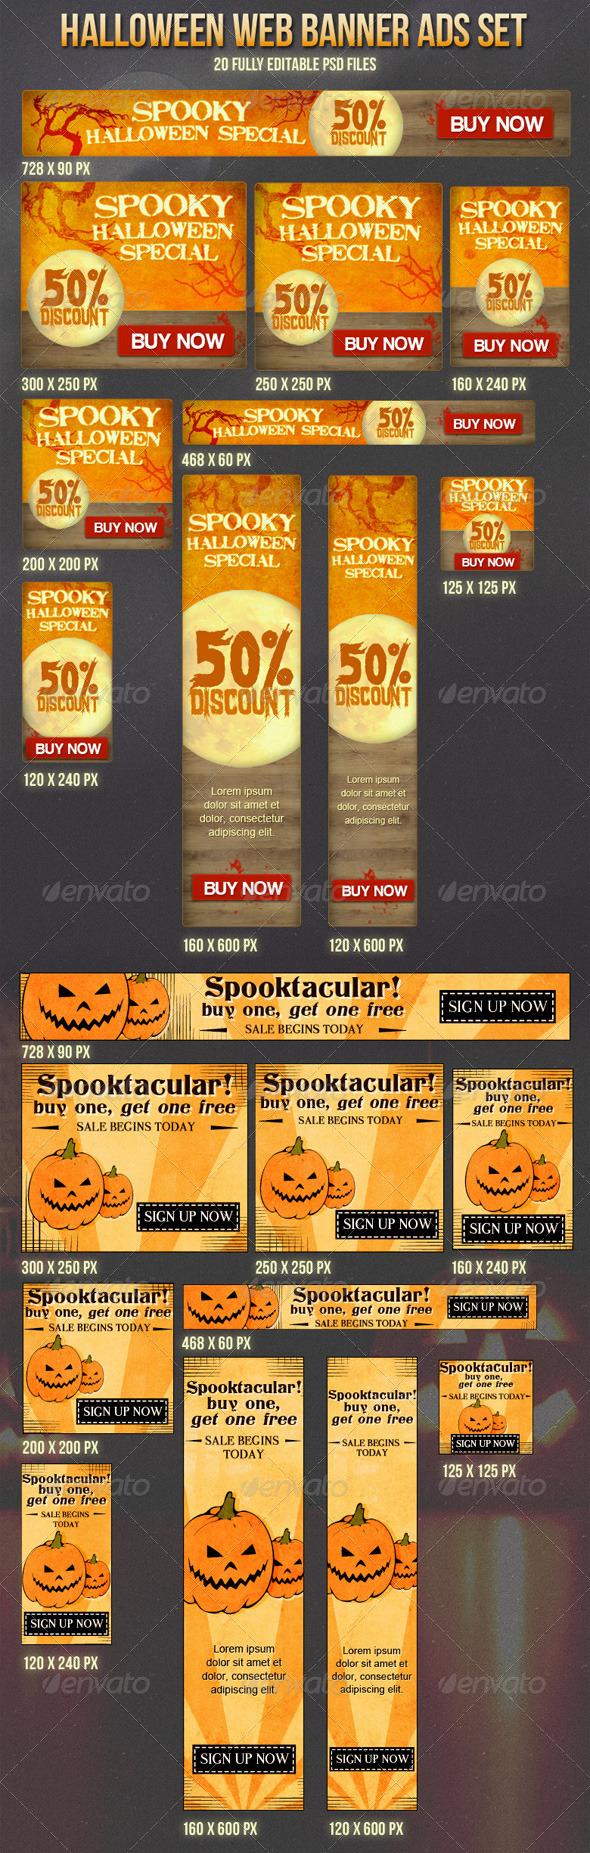 Halloween Banner Ads Set